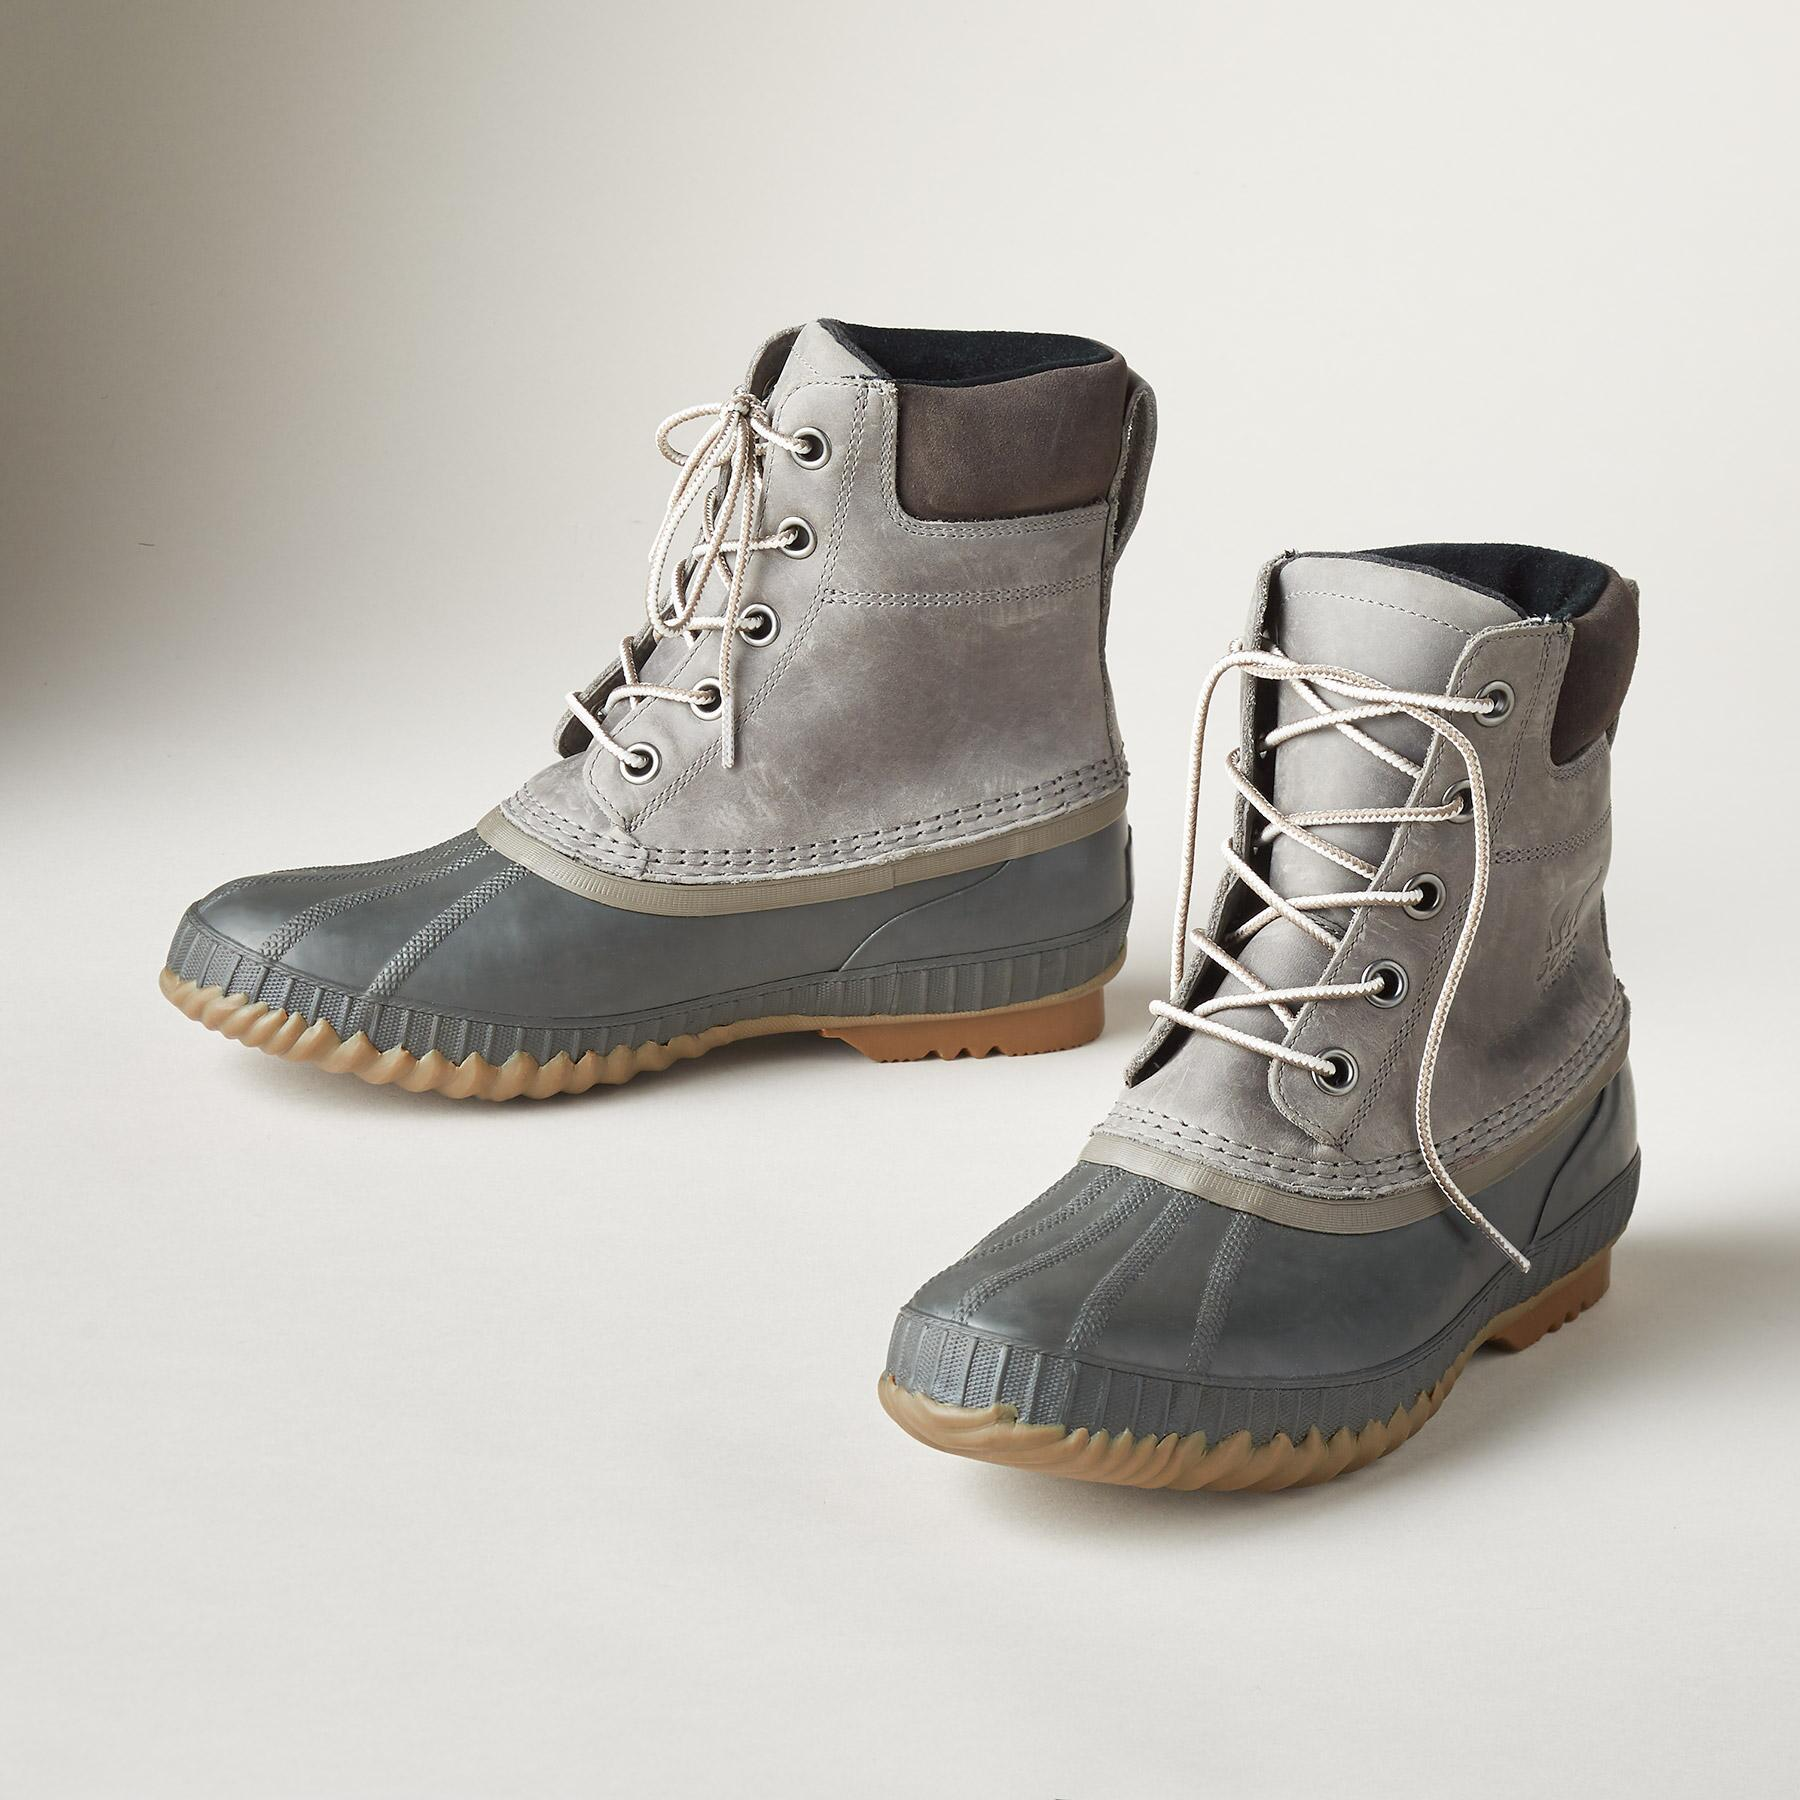 Cheyanne I I Boots